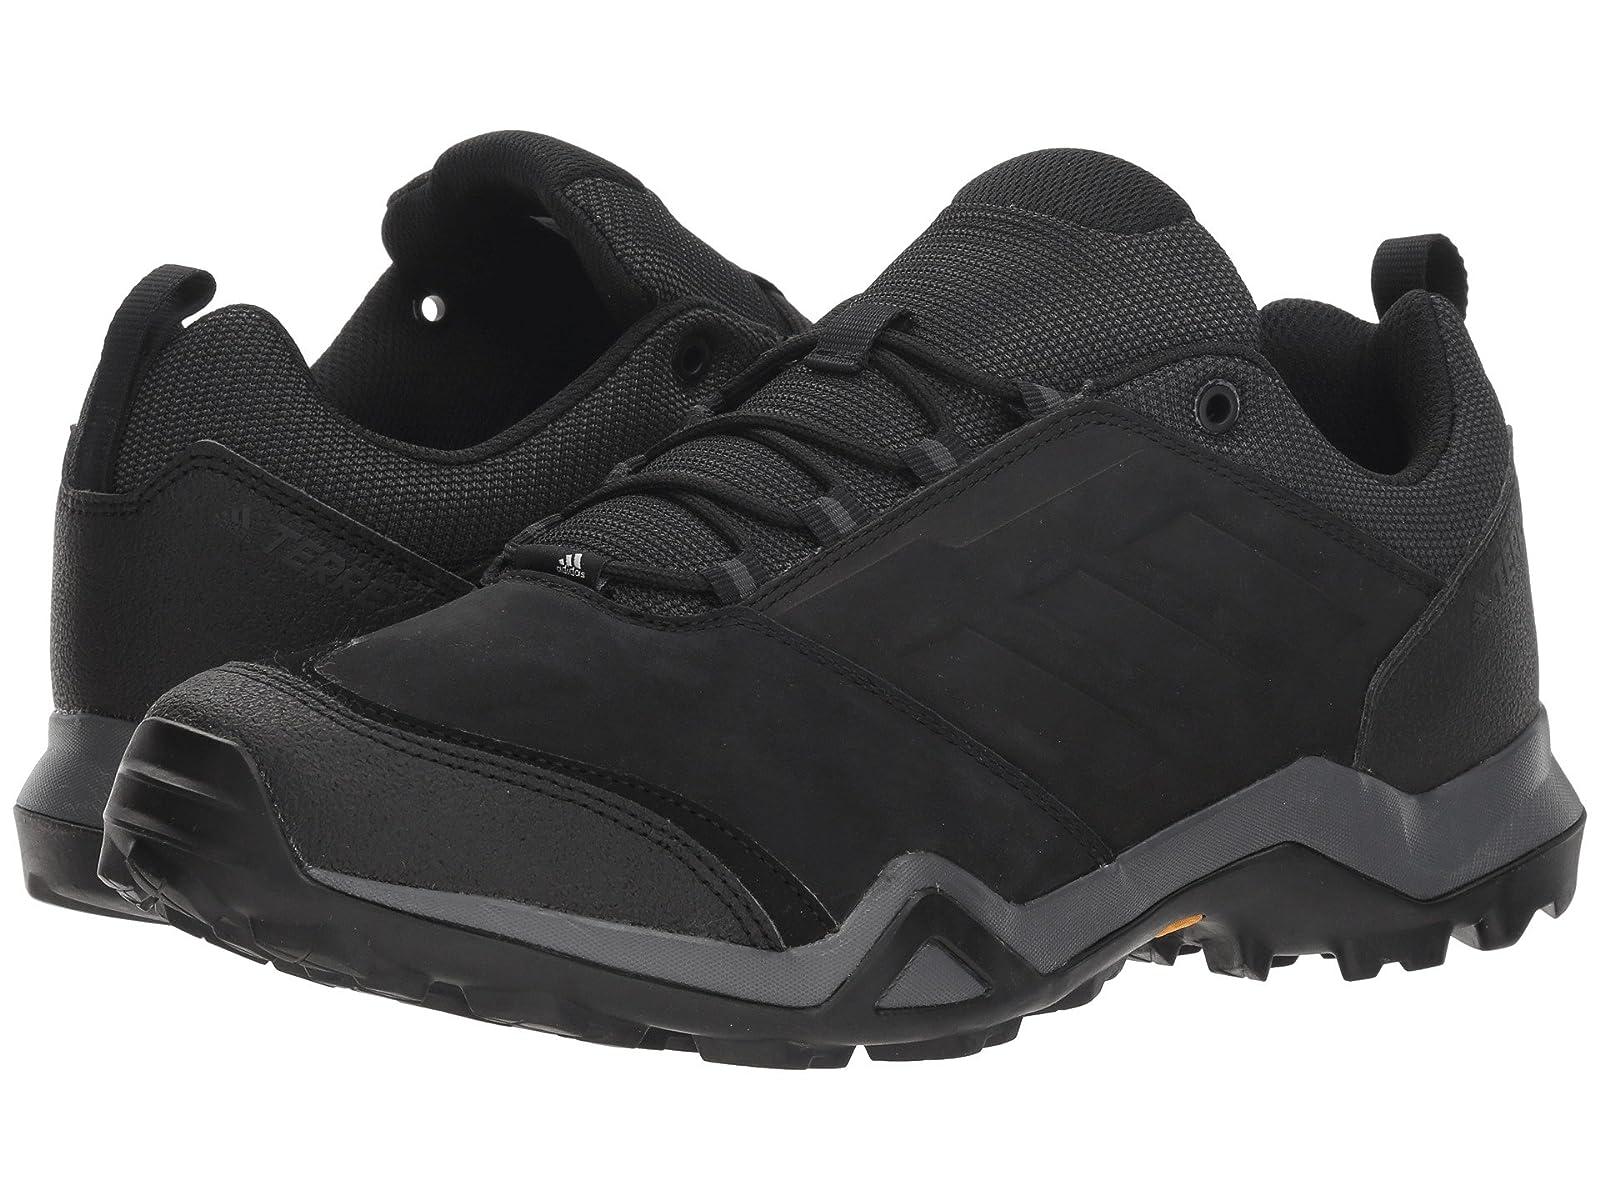 adidas adidas adidas Outdoor Terrex Brushwood Leather b33dc9